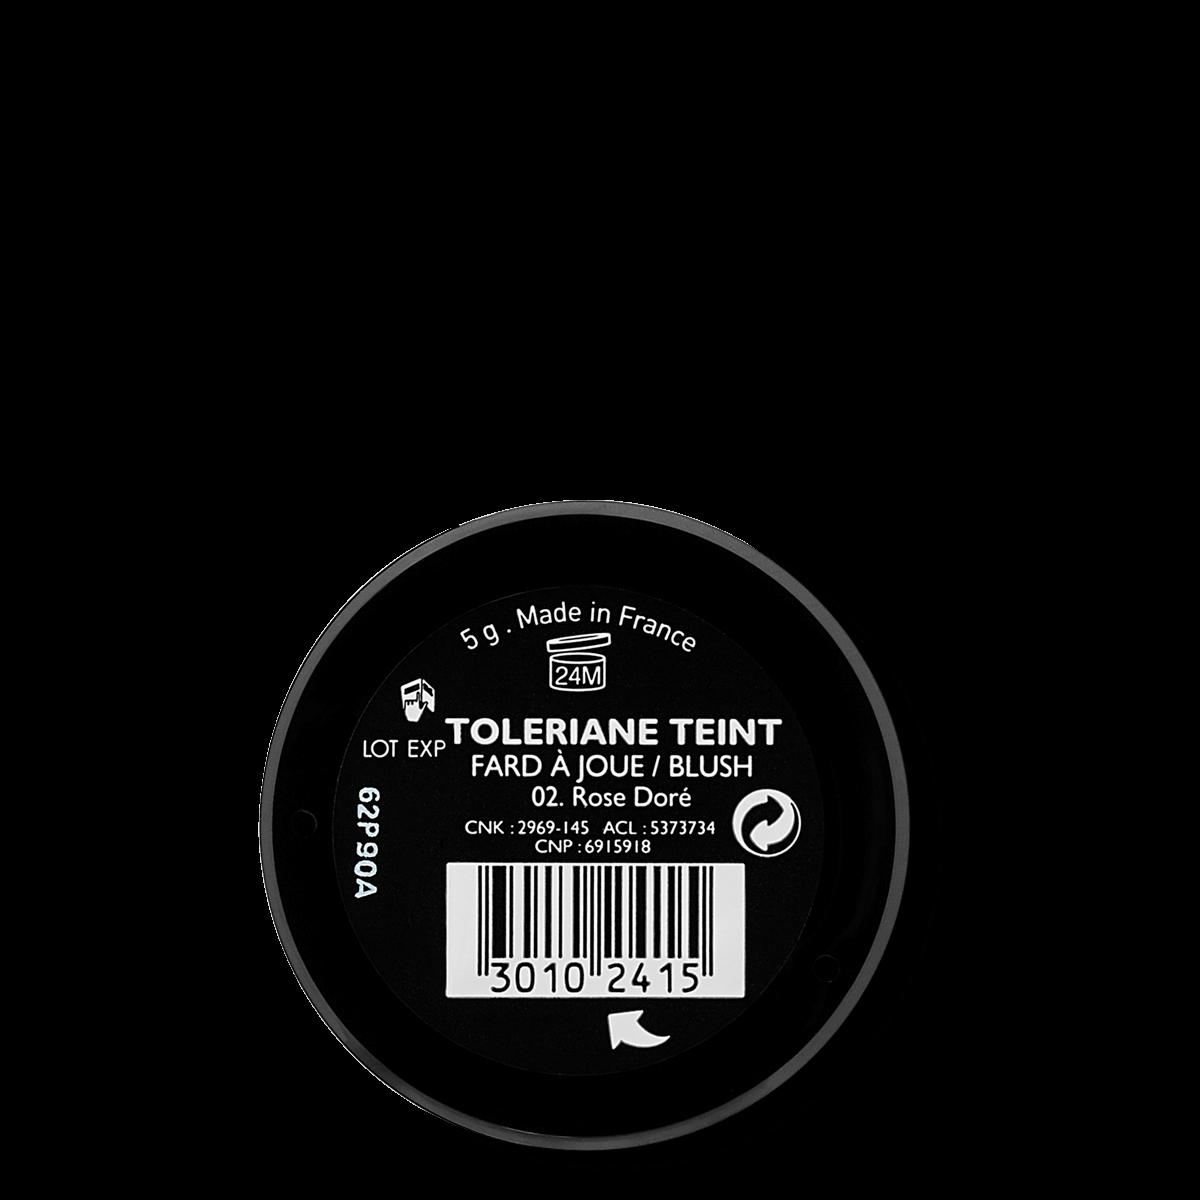 La Roche Posay Känslig Toleriane Make up BLUSH GoldenPink 30102415 B